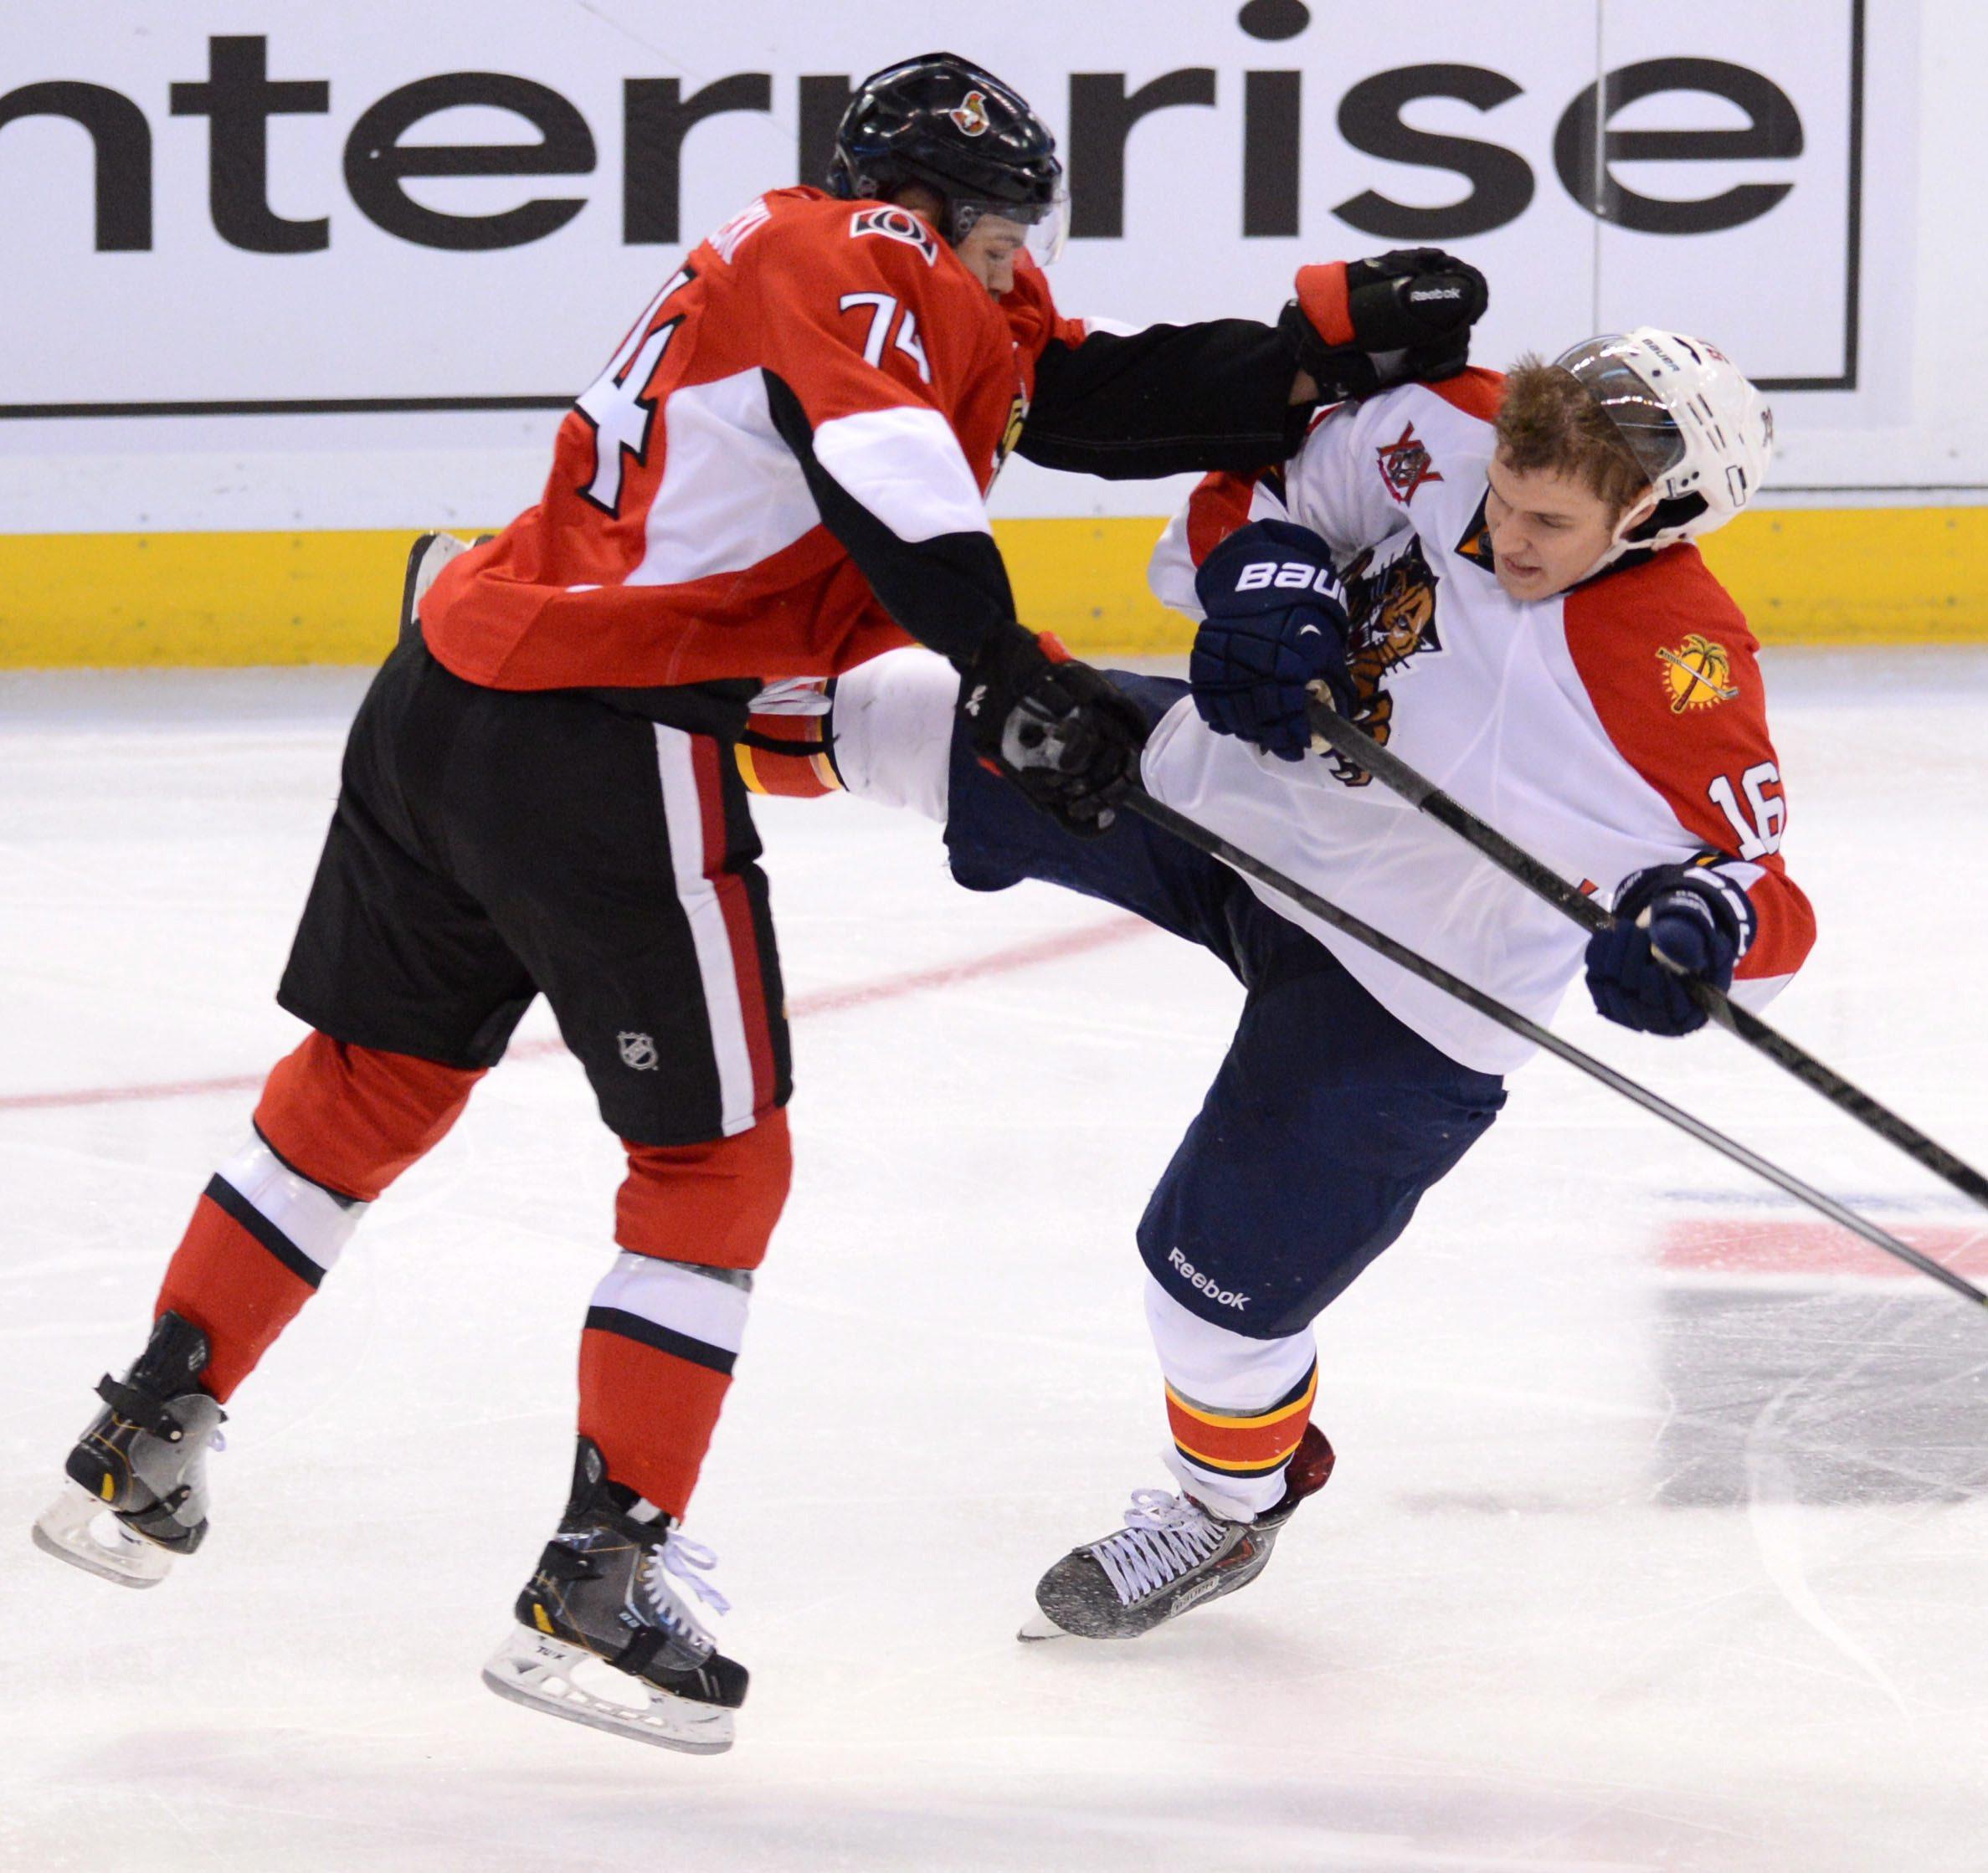 Ottawa Senators' Mark Borowiecki hits Florida Panthers' Aleksander Barkov during second period of an NHL hockey game in Ottawa, Ontario, on Saturday, Nov. 9, 2013